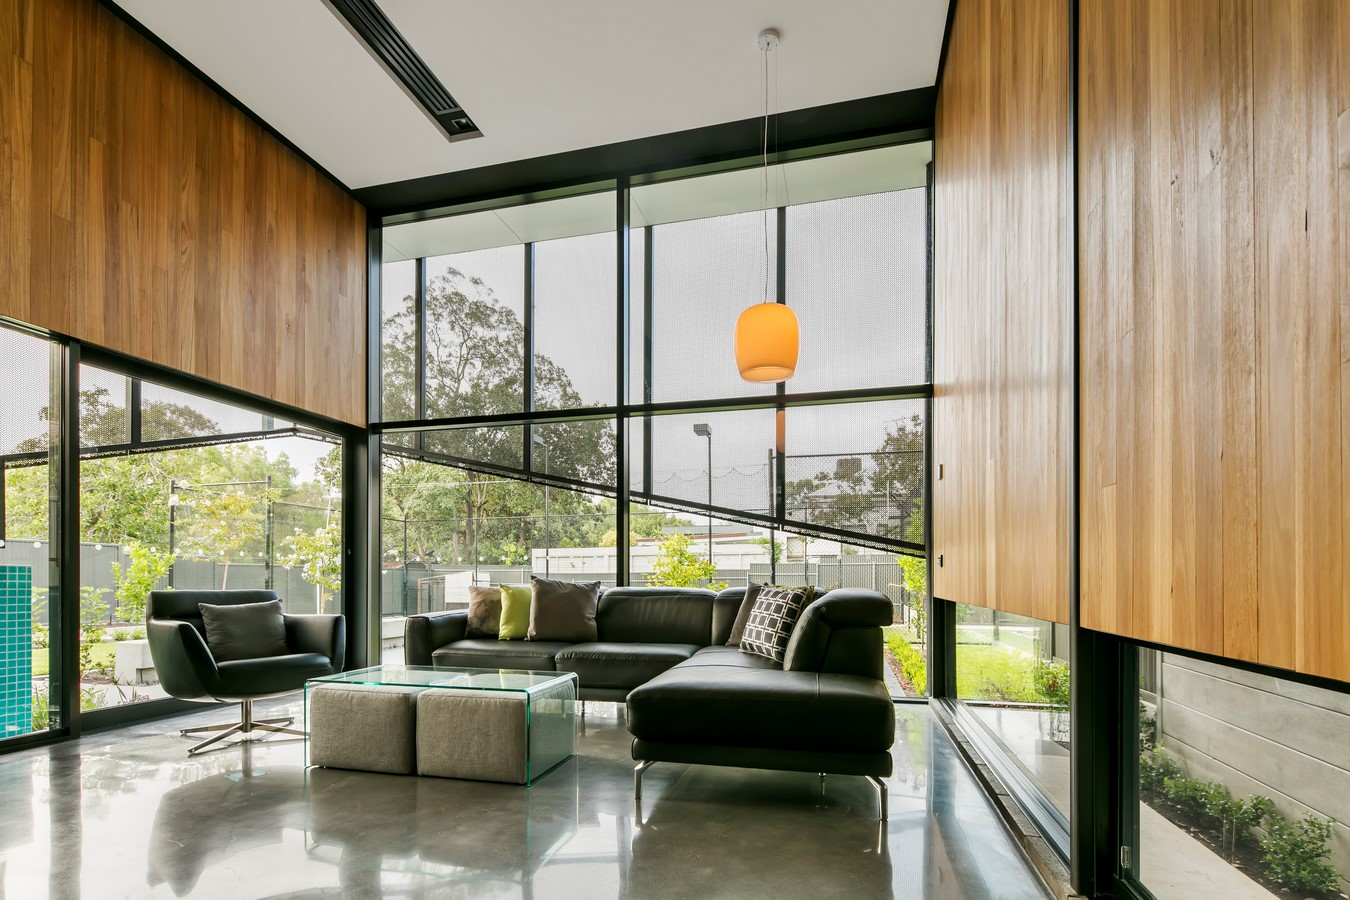 Veil Mortar By Khab Architects - Sheet1